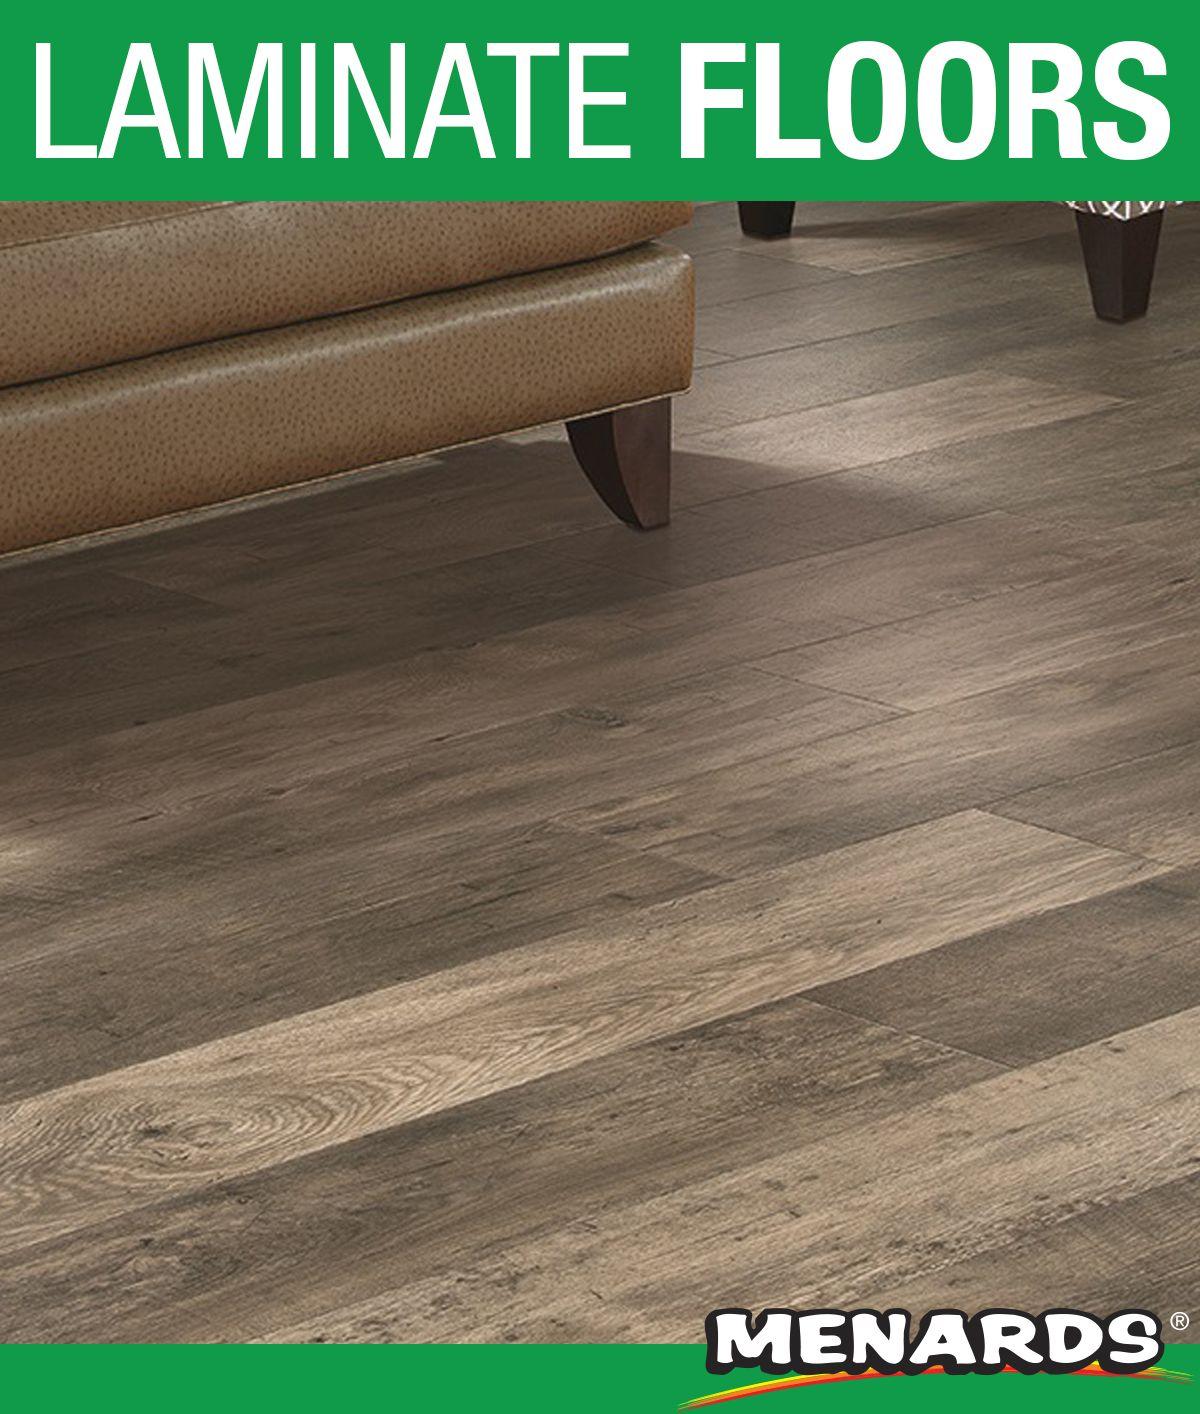 Mohawk Perfectseal Laminate Flooring Uses An Innovative Waterproof